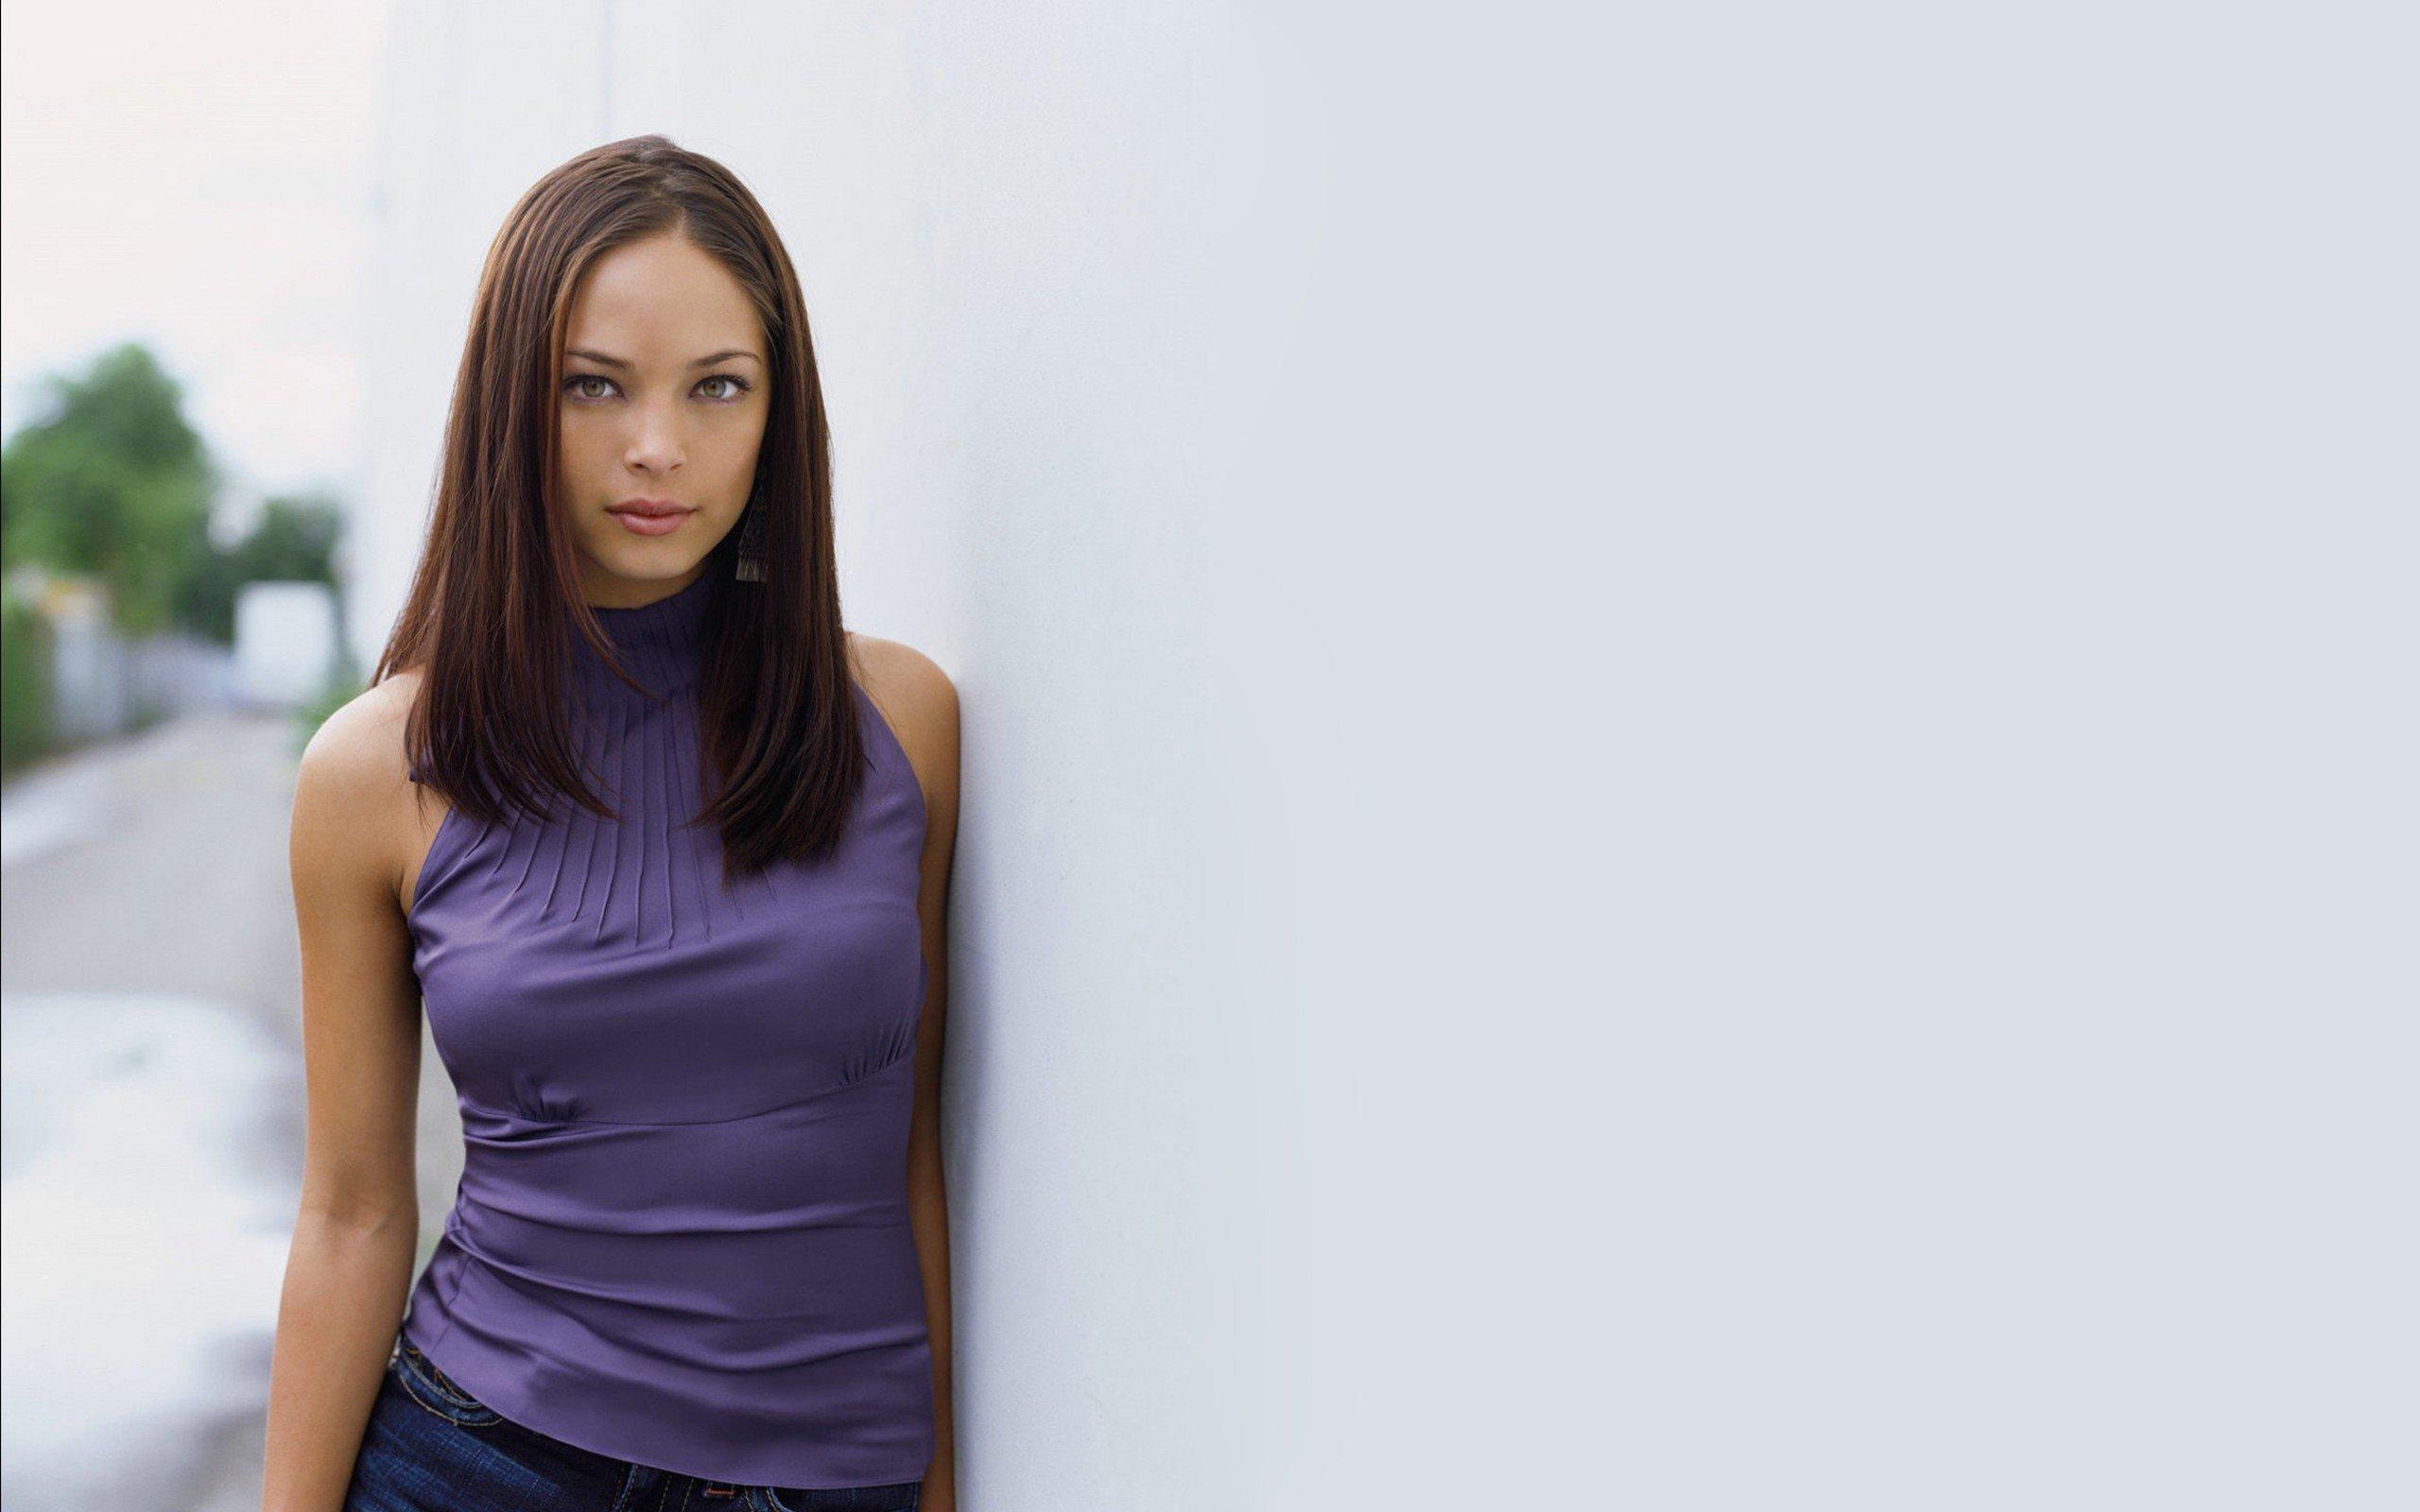 brunette, Kristin Kreuk, Actress, Blouses, Women Wallpaper